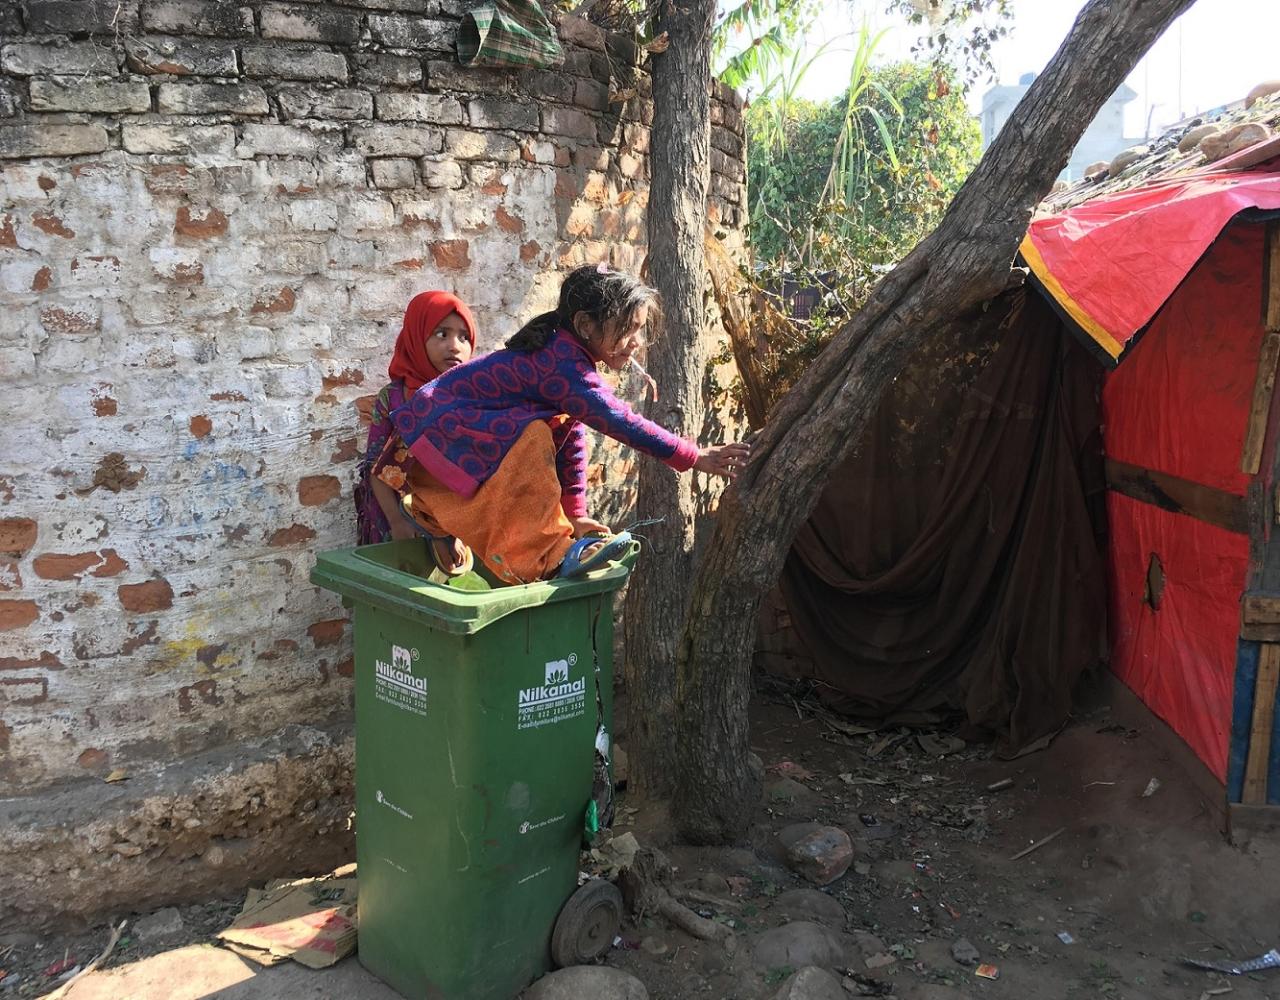 A girl plays with trash at a Rohingya camp in Bhatindi's Kiryani Talab